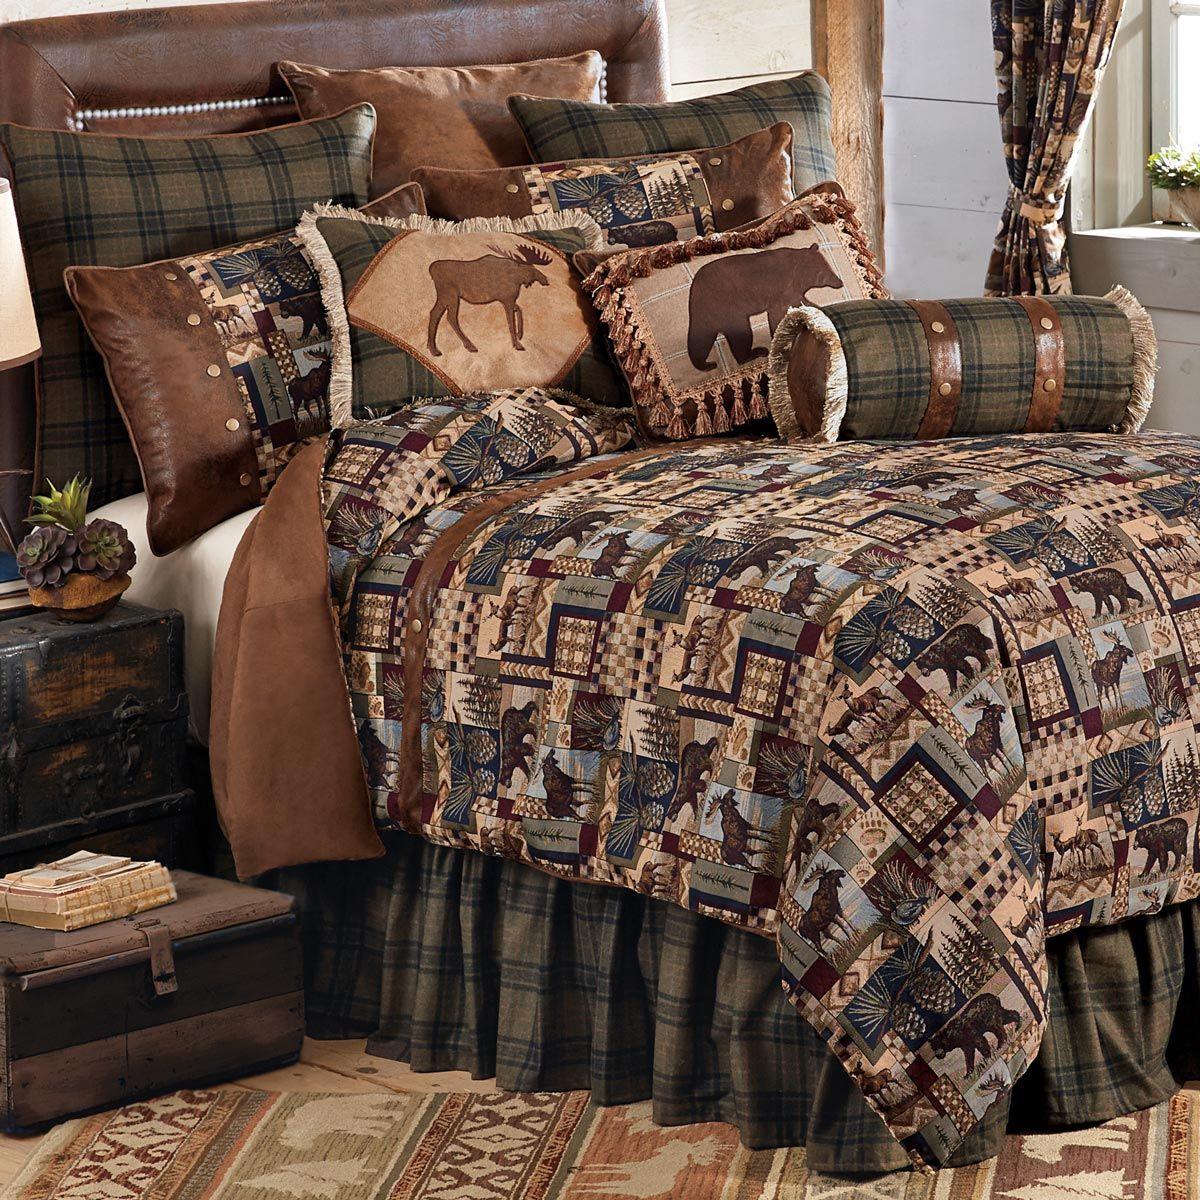 Woodland Cabin Bed Set Queen Rustic bedding sets